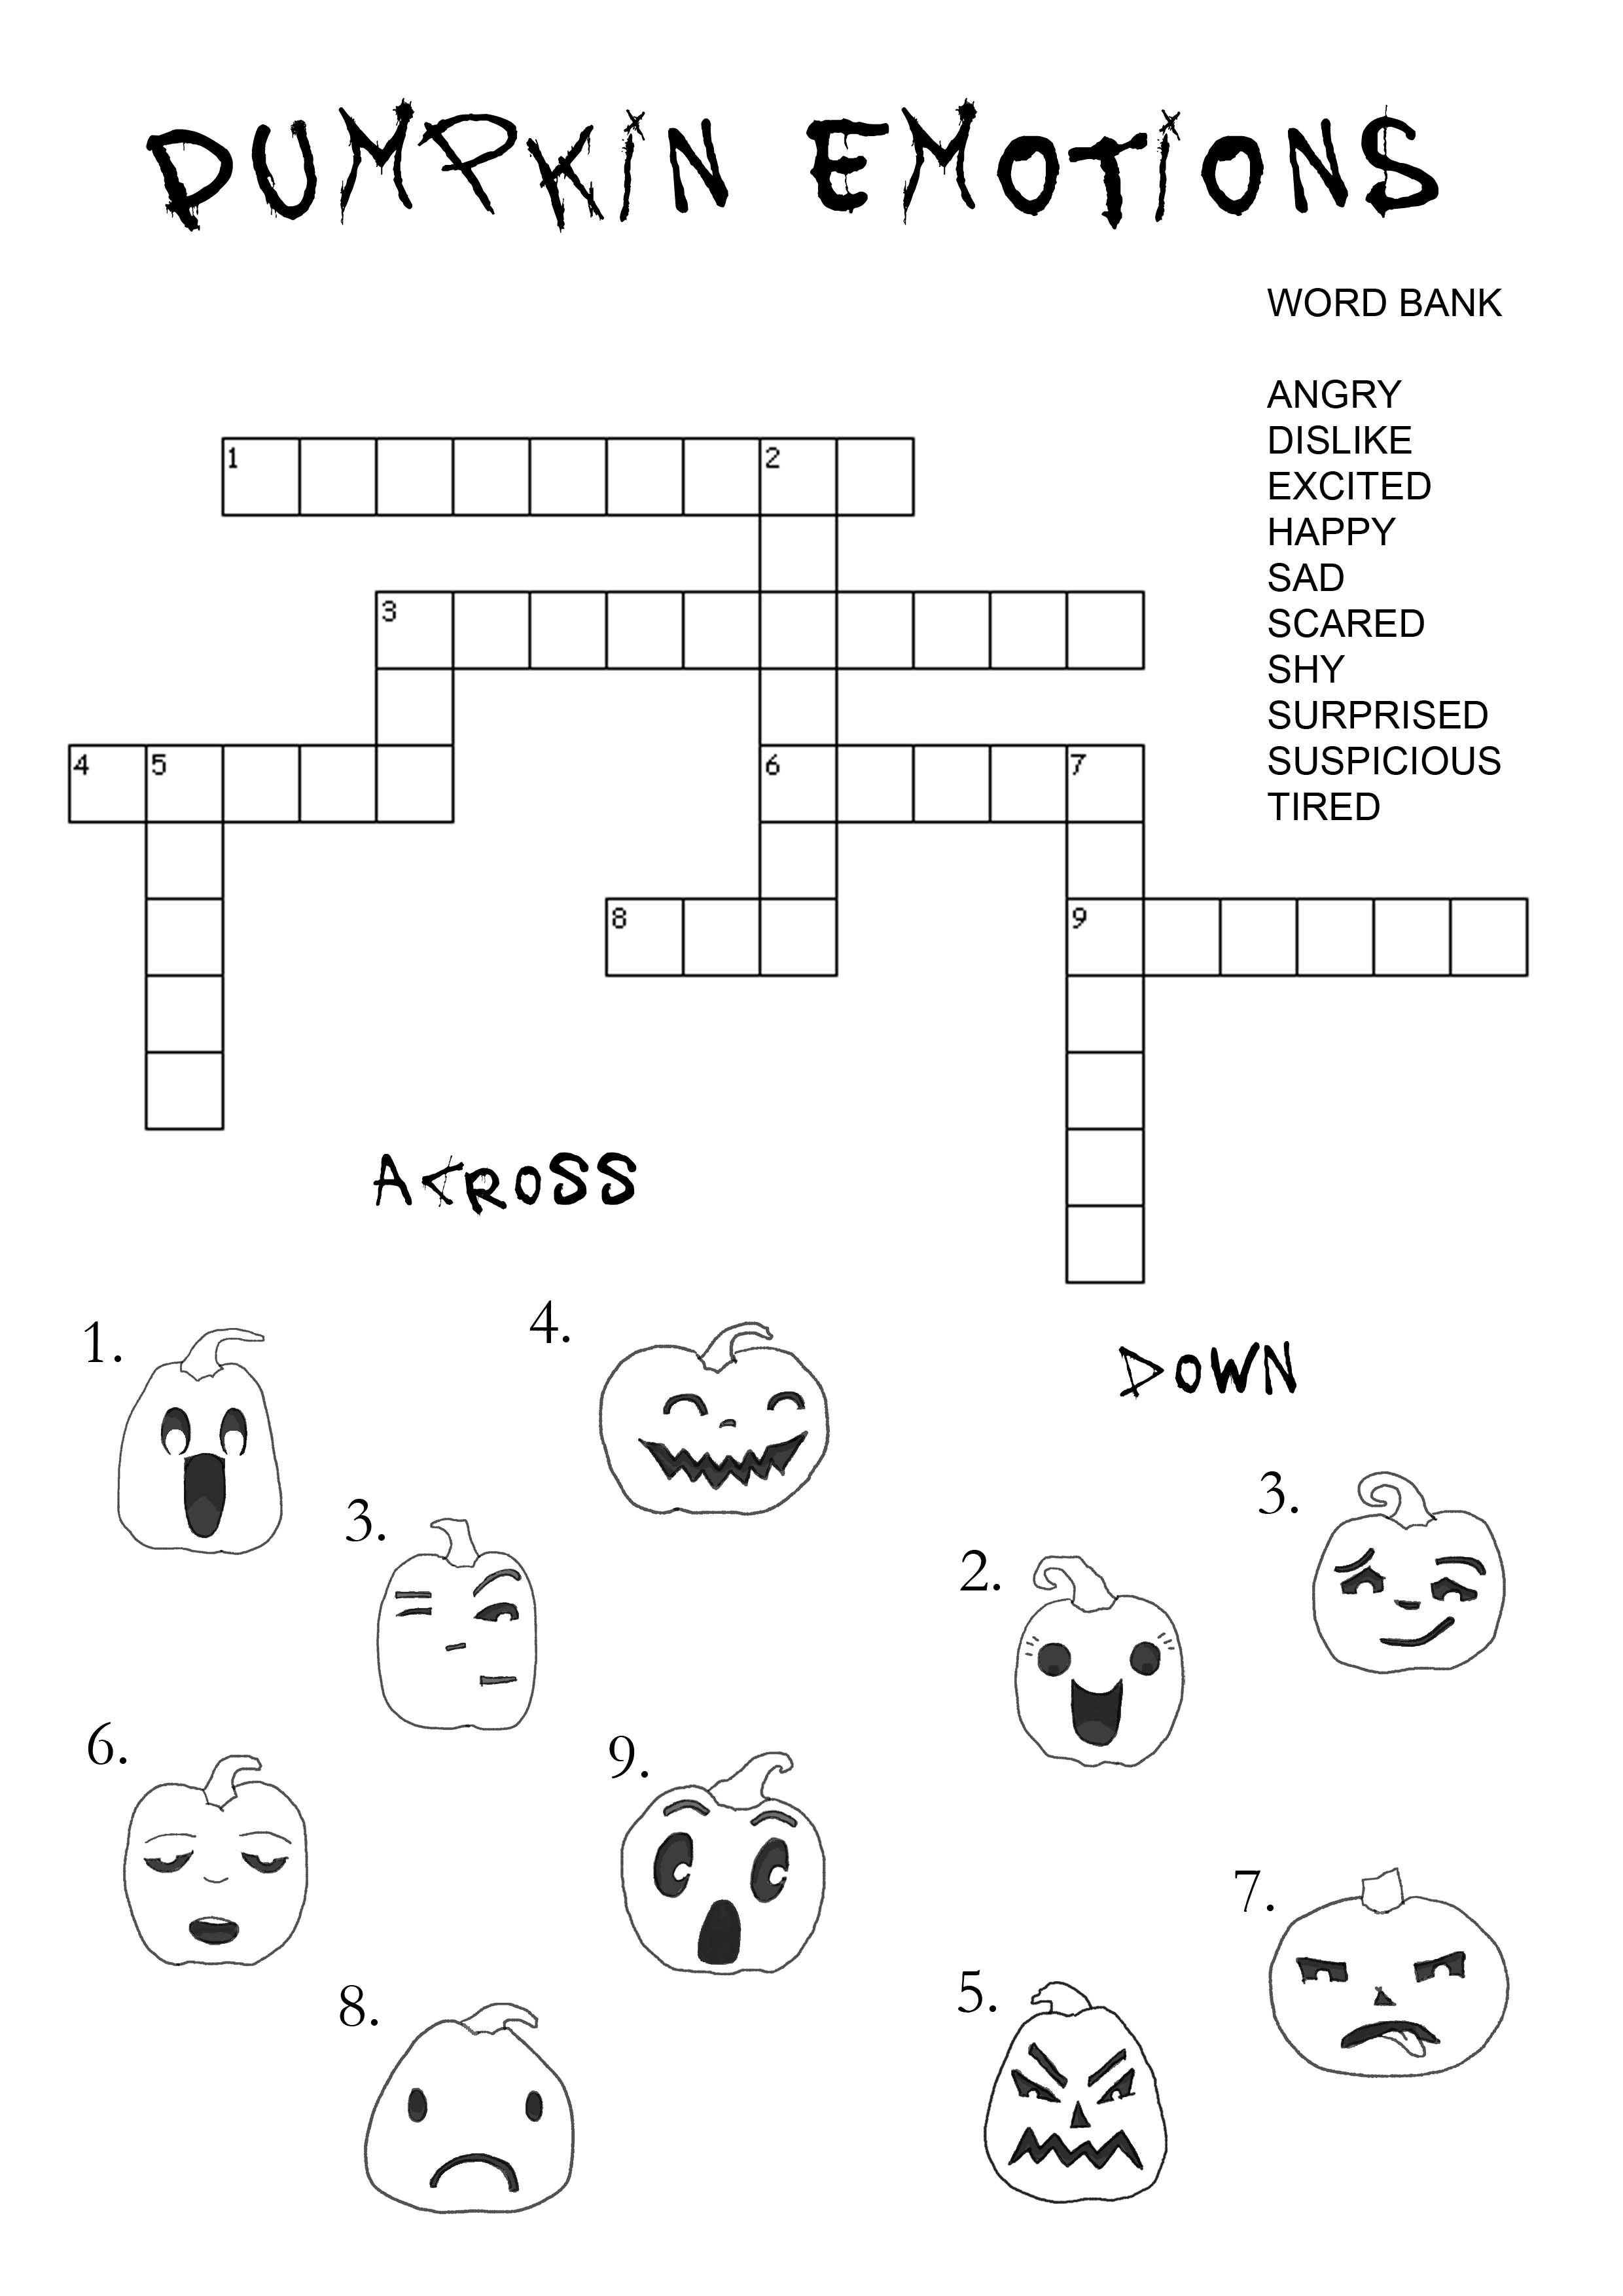 Pumpkin Emotions Crossword Puzzle